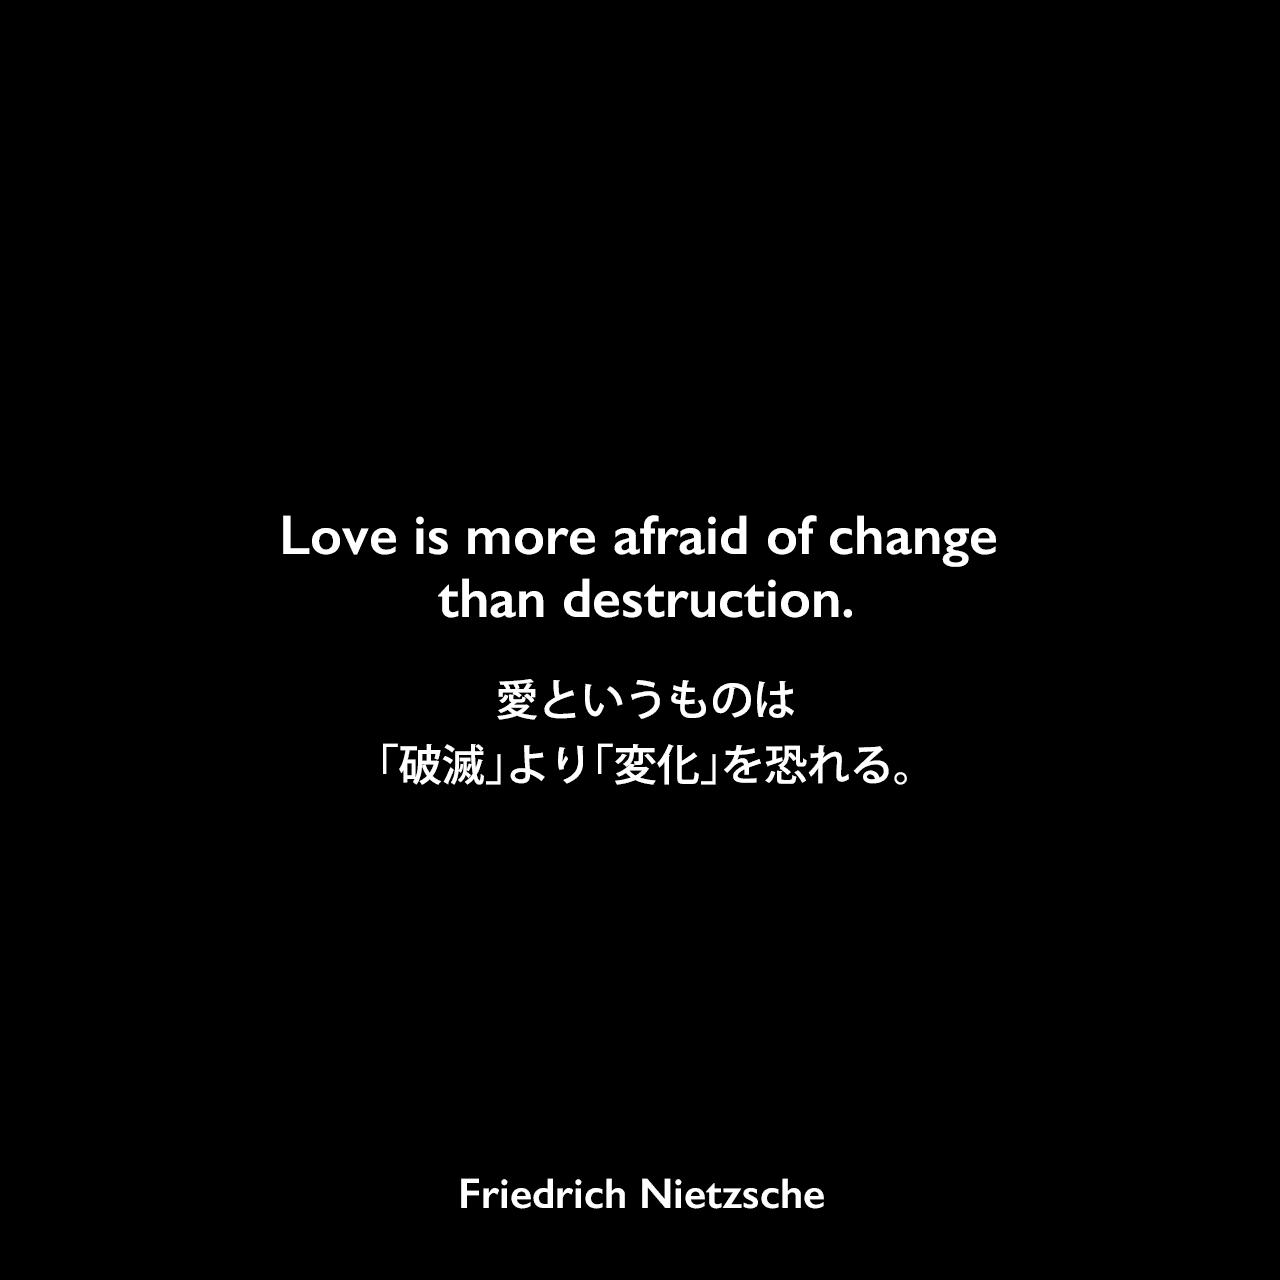 Love is more afraid of change than destruction.愛というものは、「破滅」より「変化」を恐れる。Friedrich Nietzsche